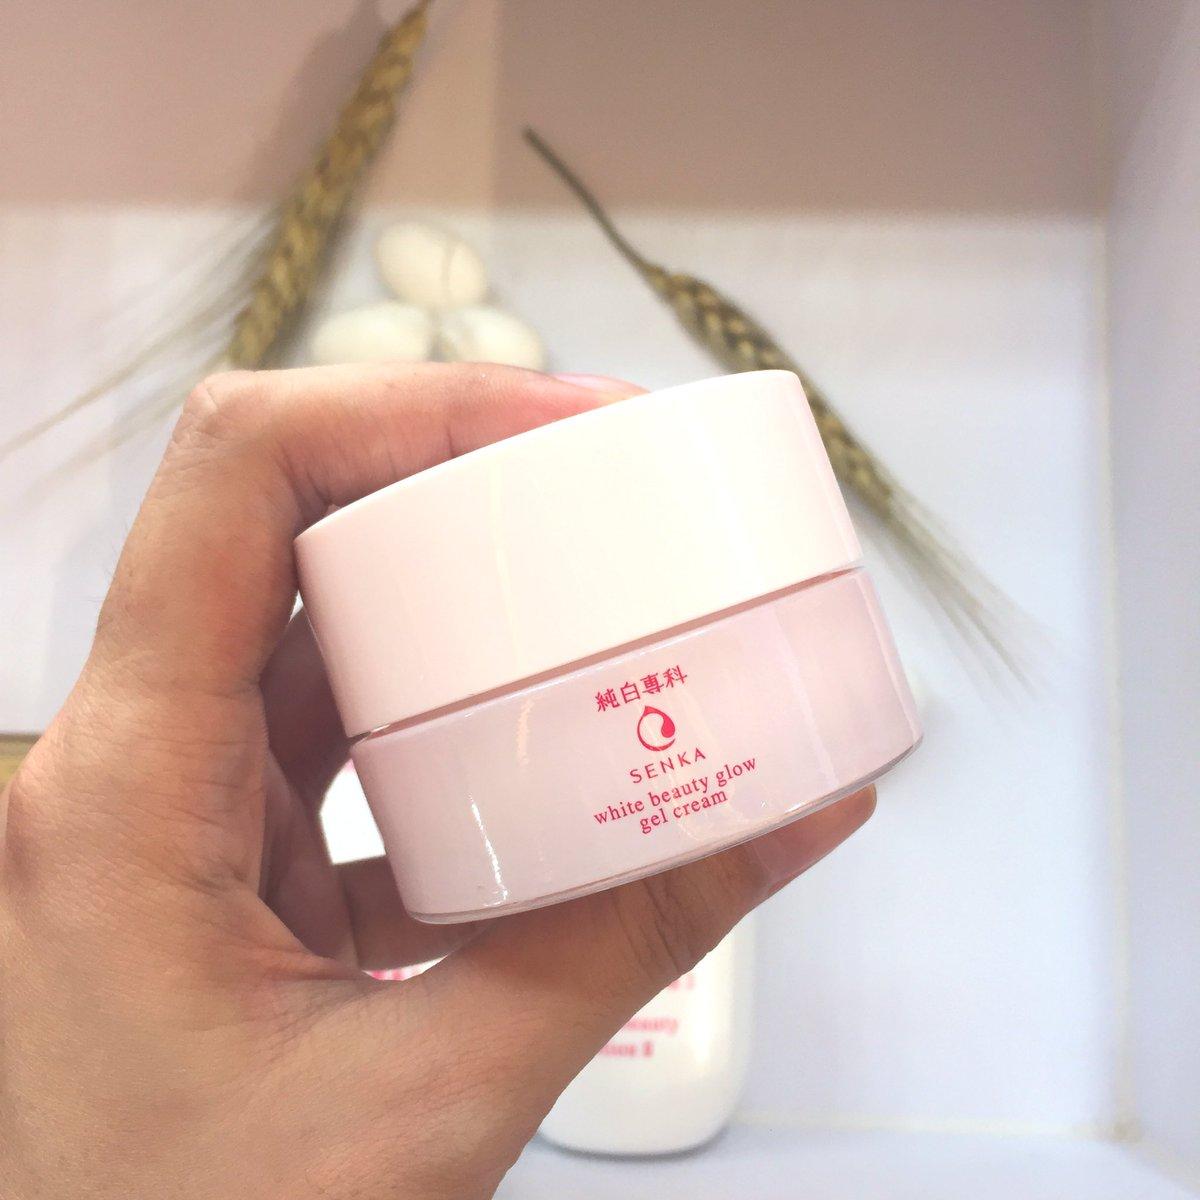 Combo Kem Dưỡng Trắng Senka White Beauty Glow Gel Cream & Tinh Chất Senka White Beauty Serum 35g